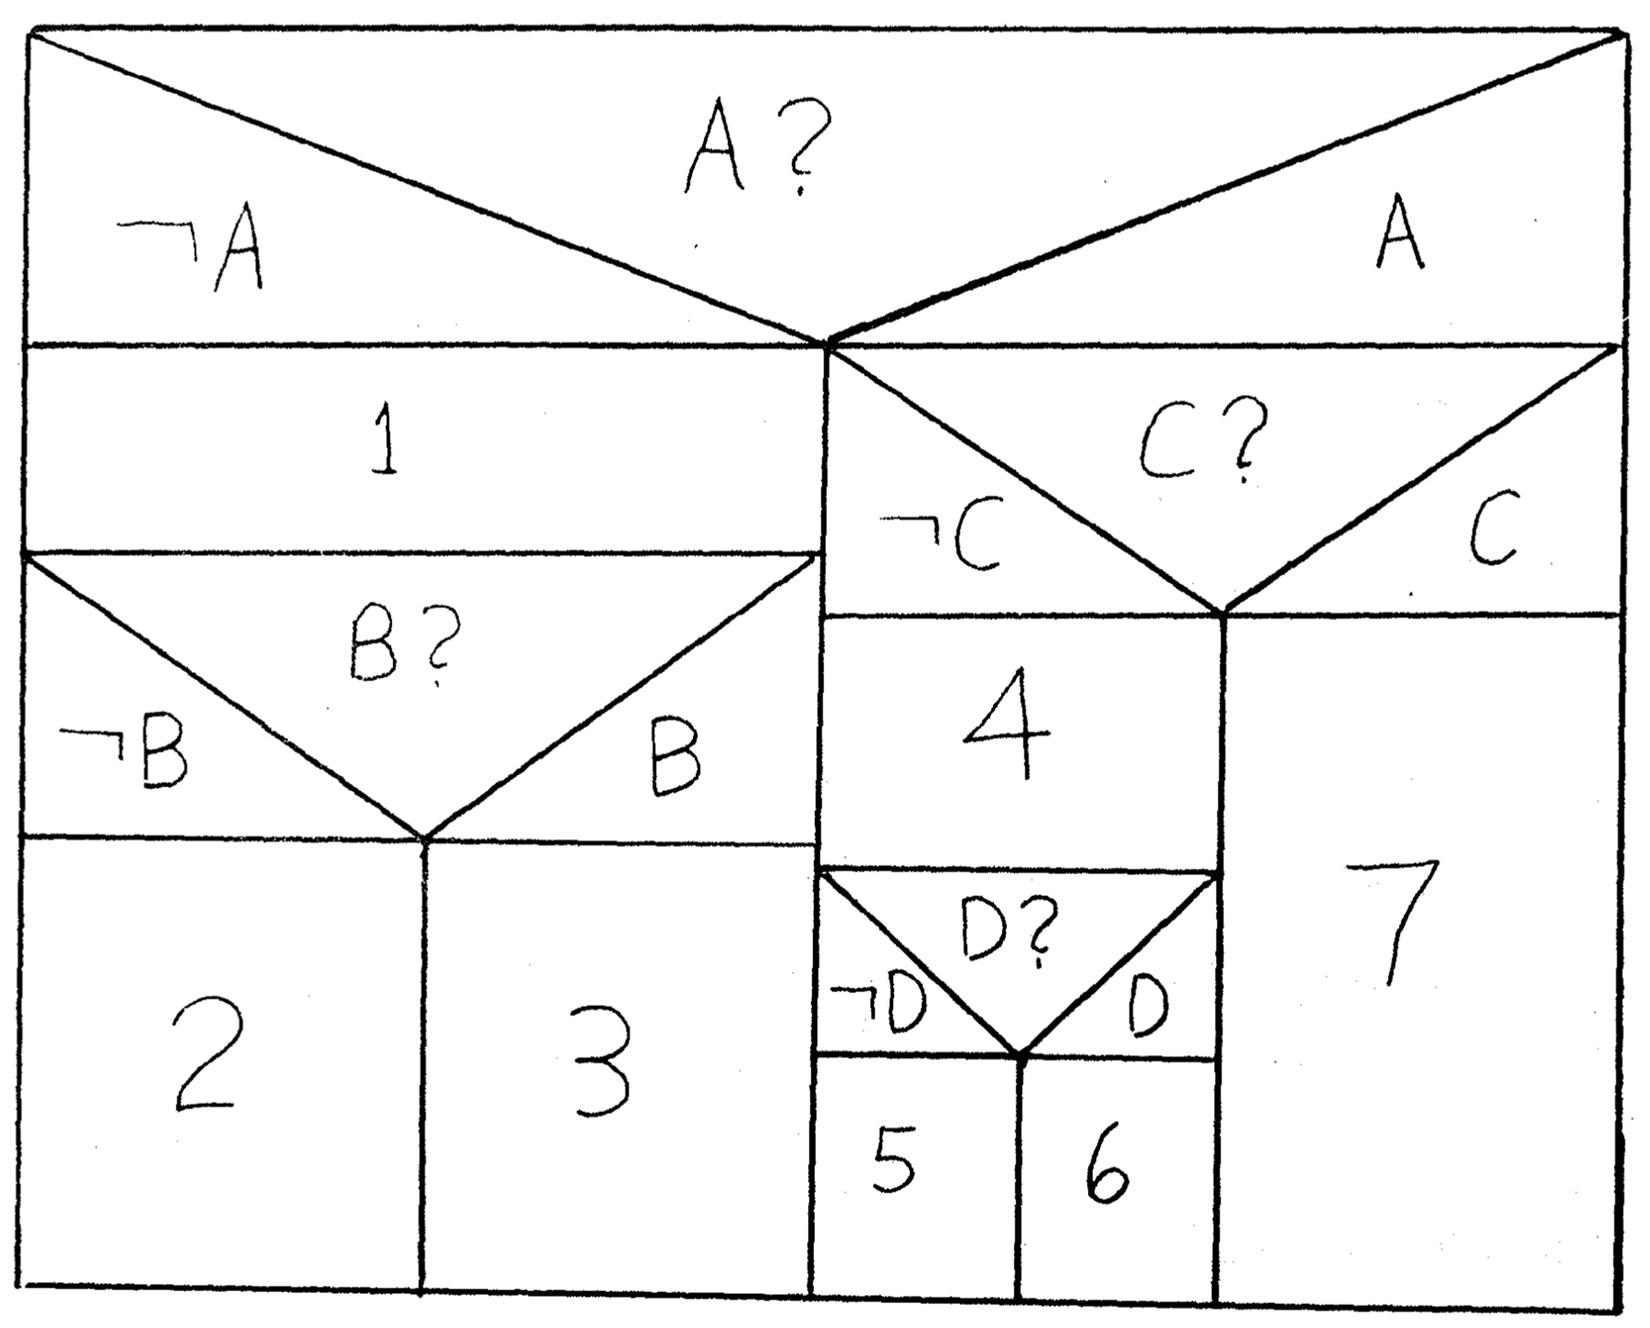 Nassi Shneiderman Diagrams